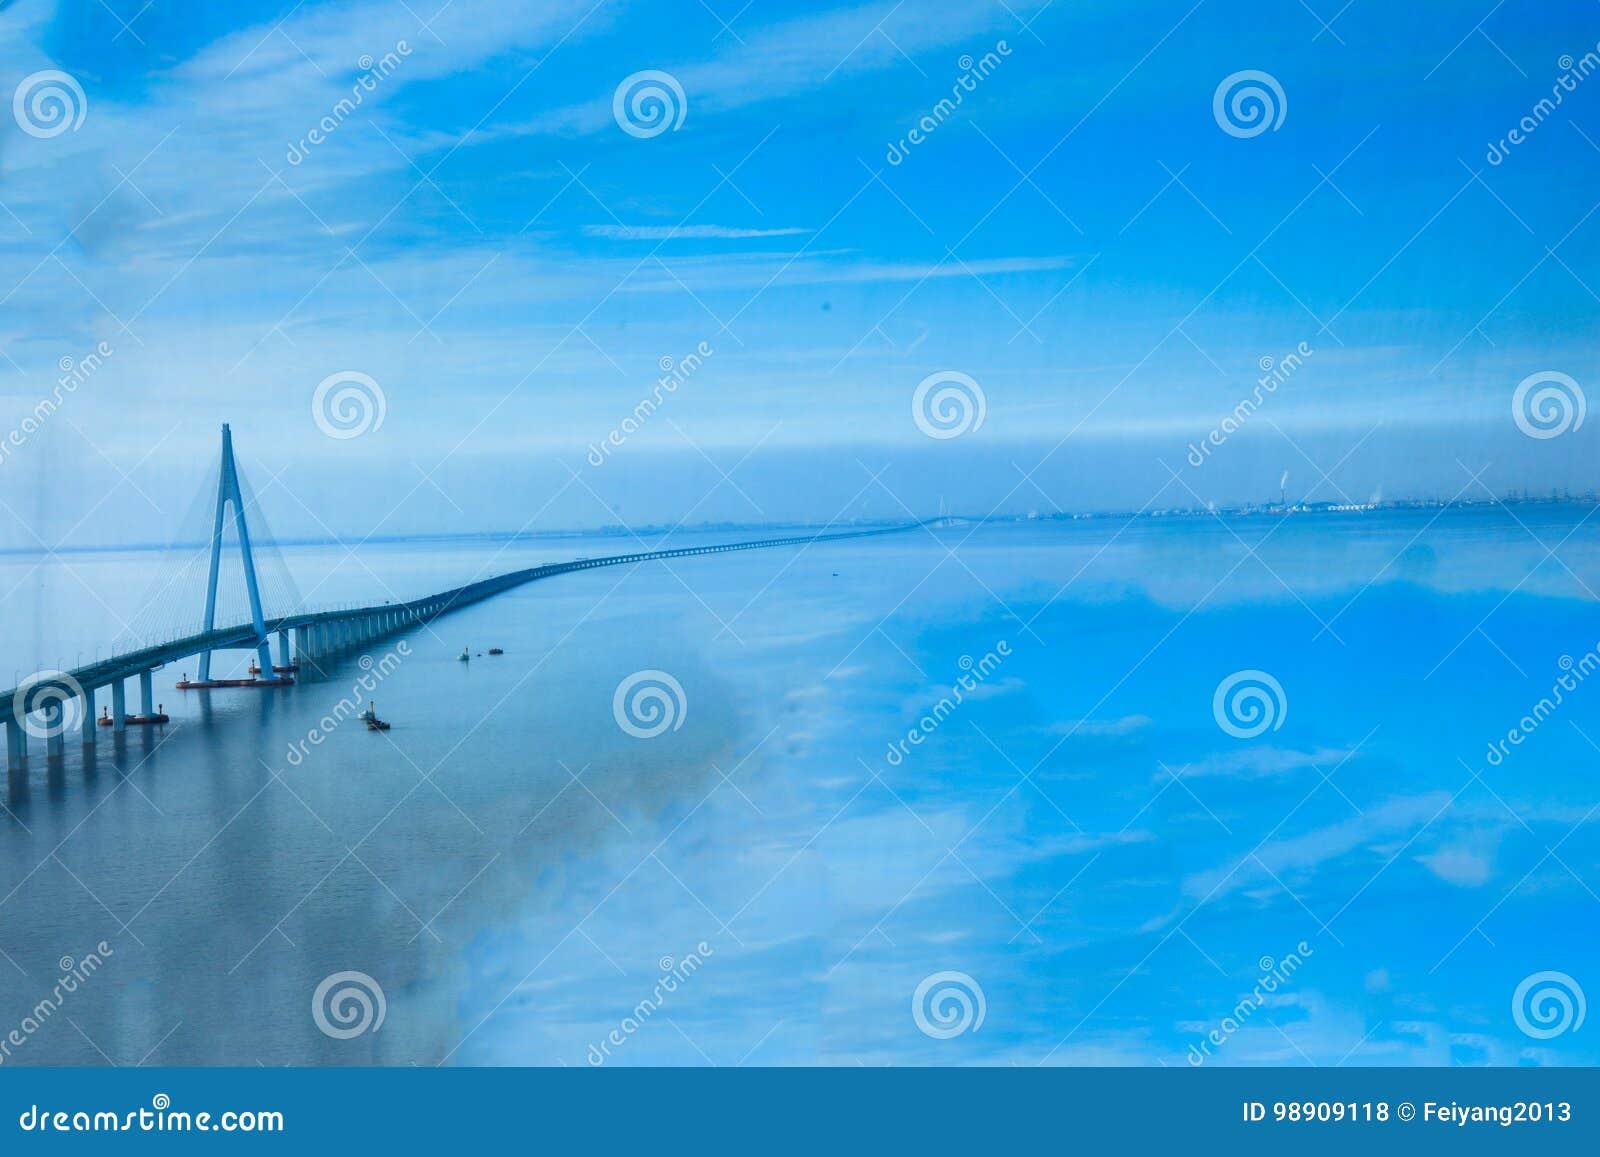 China `s Hangzhou Bay Bridge Editorial Stock Photo - Image